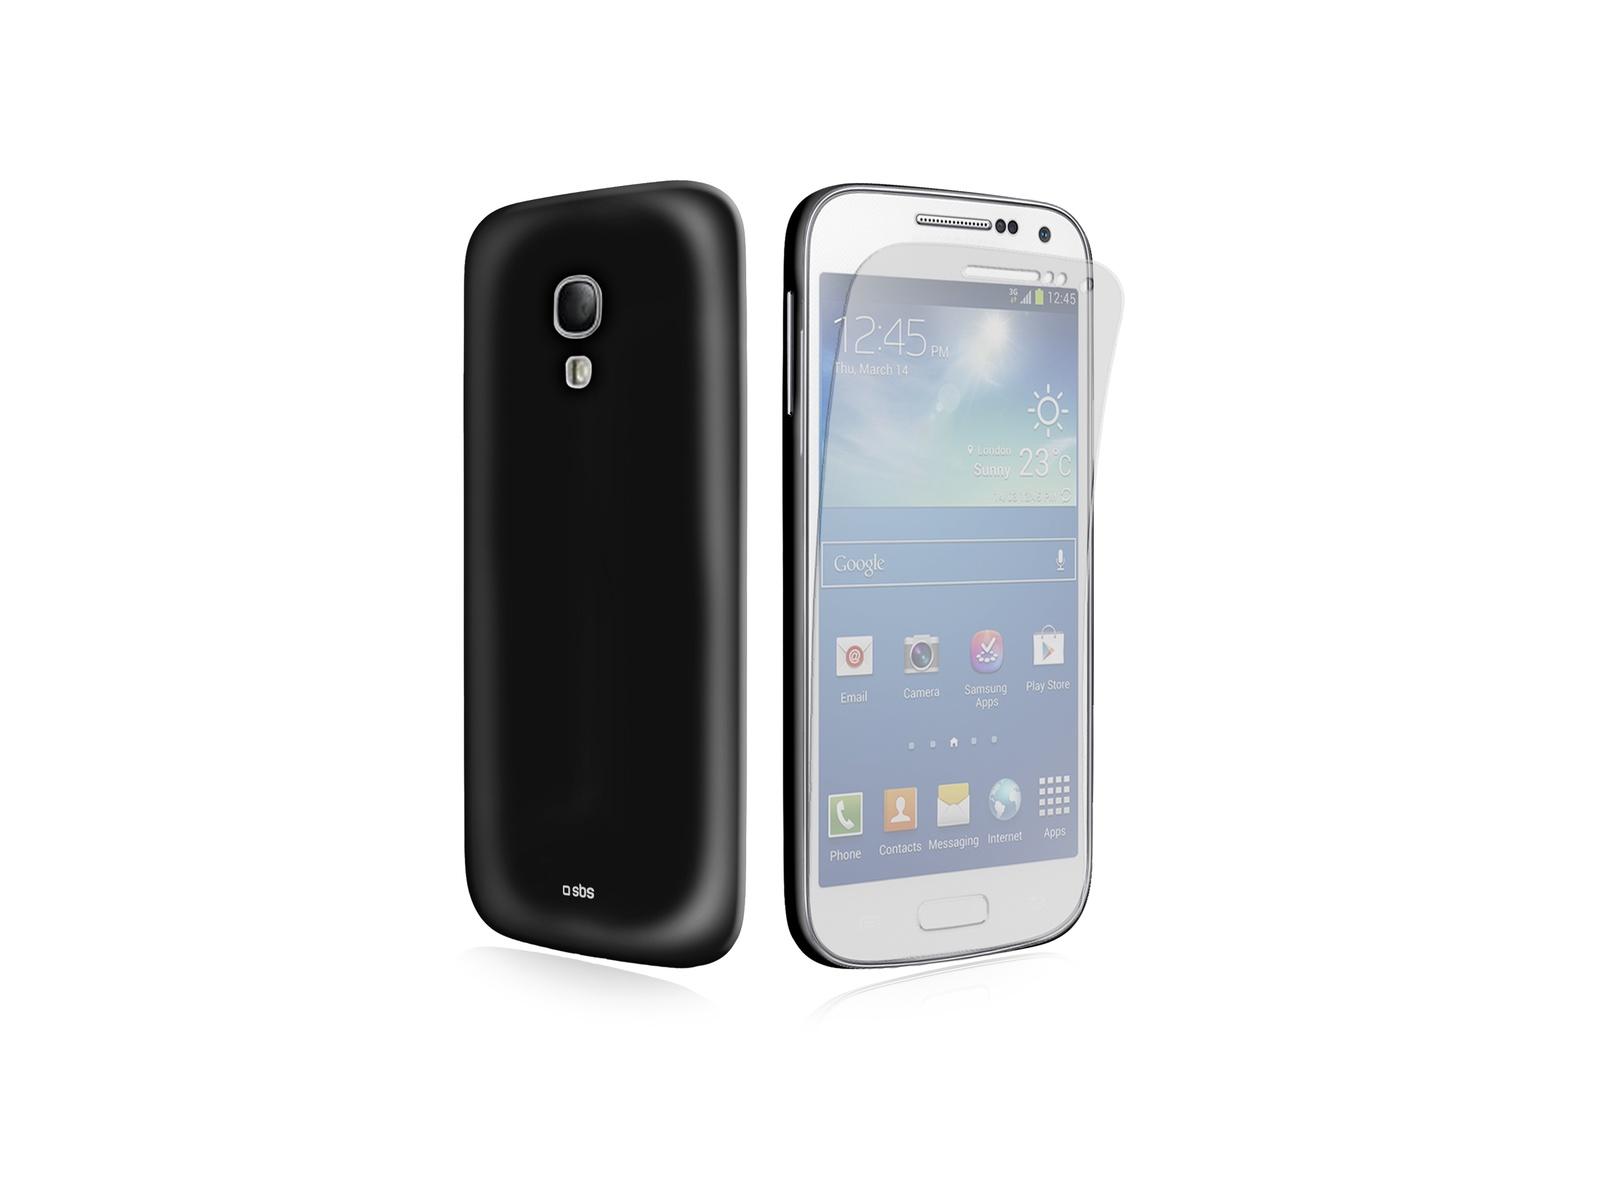 Чехол SBS для Samsung Galaxy S4 Mini I9190 (Aero, черный) + пленка защитная недорого